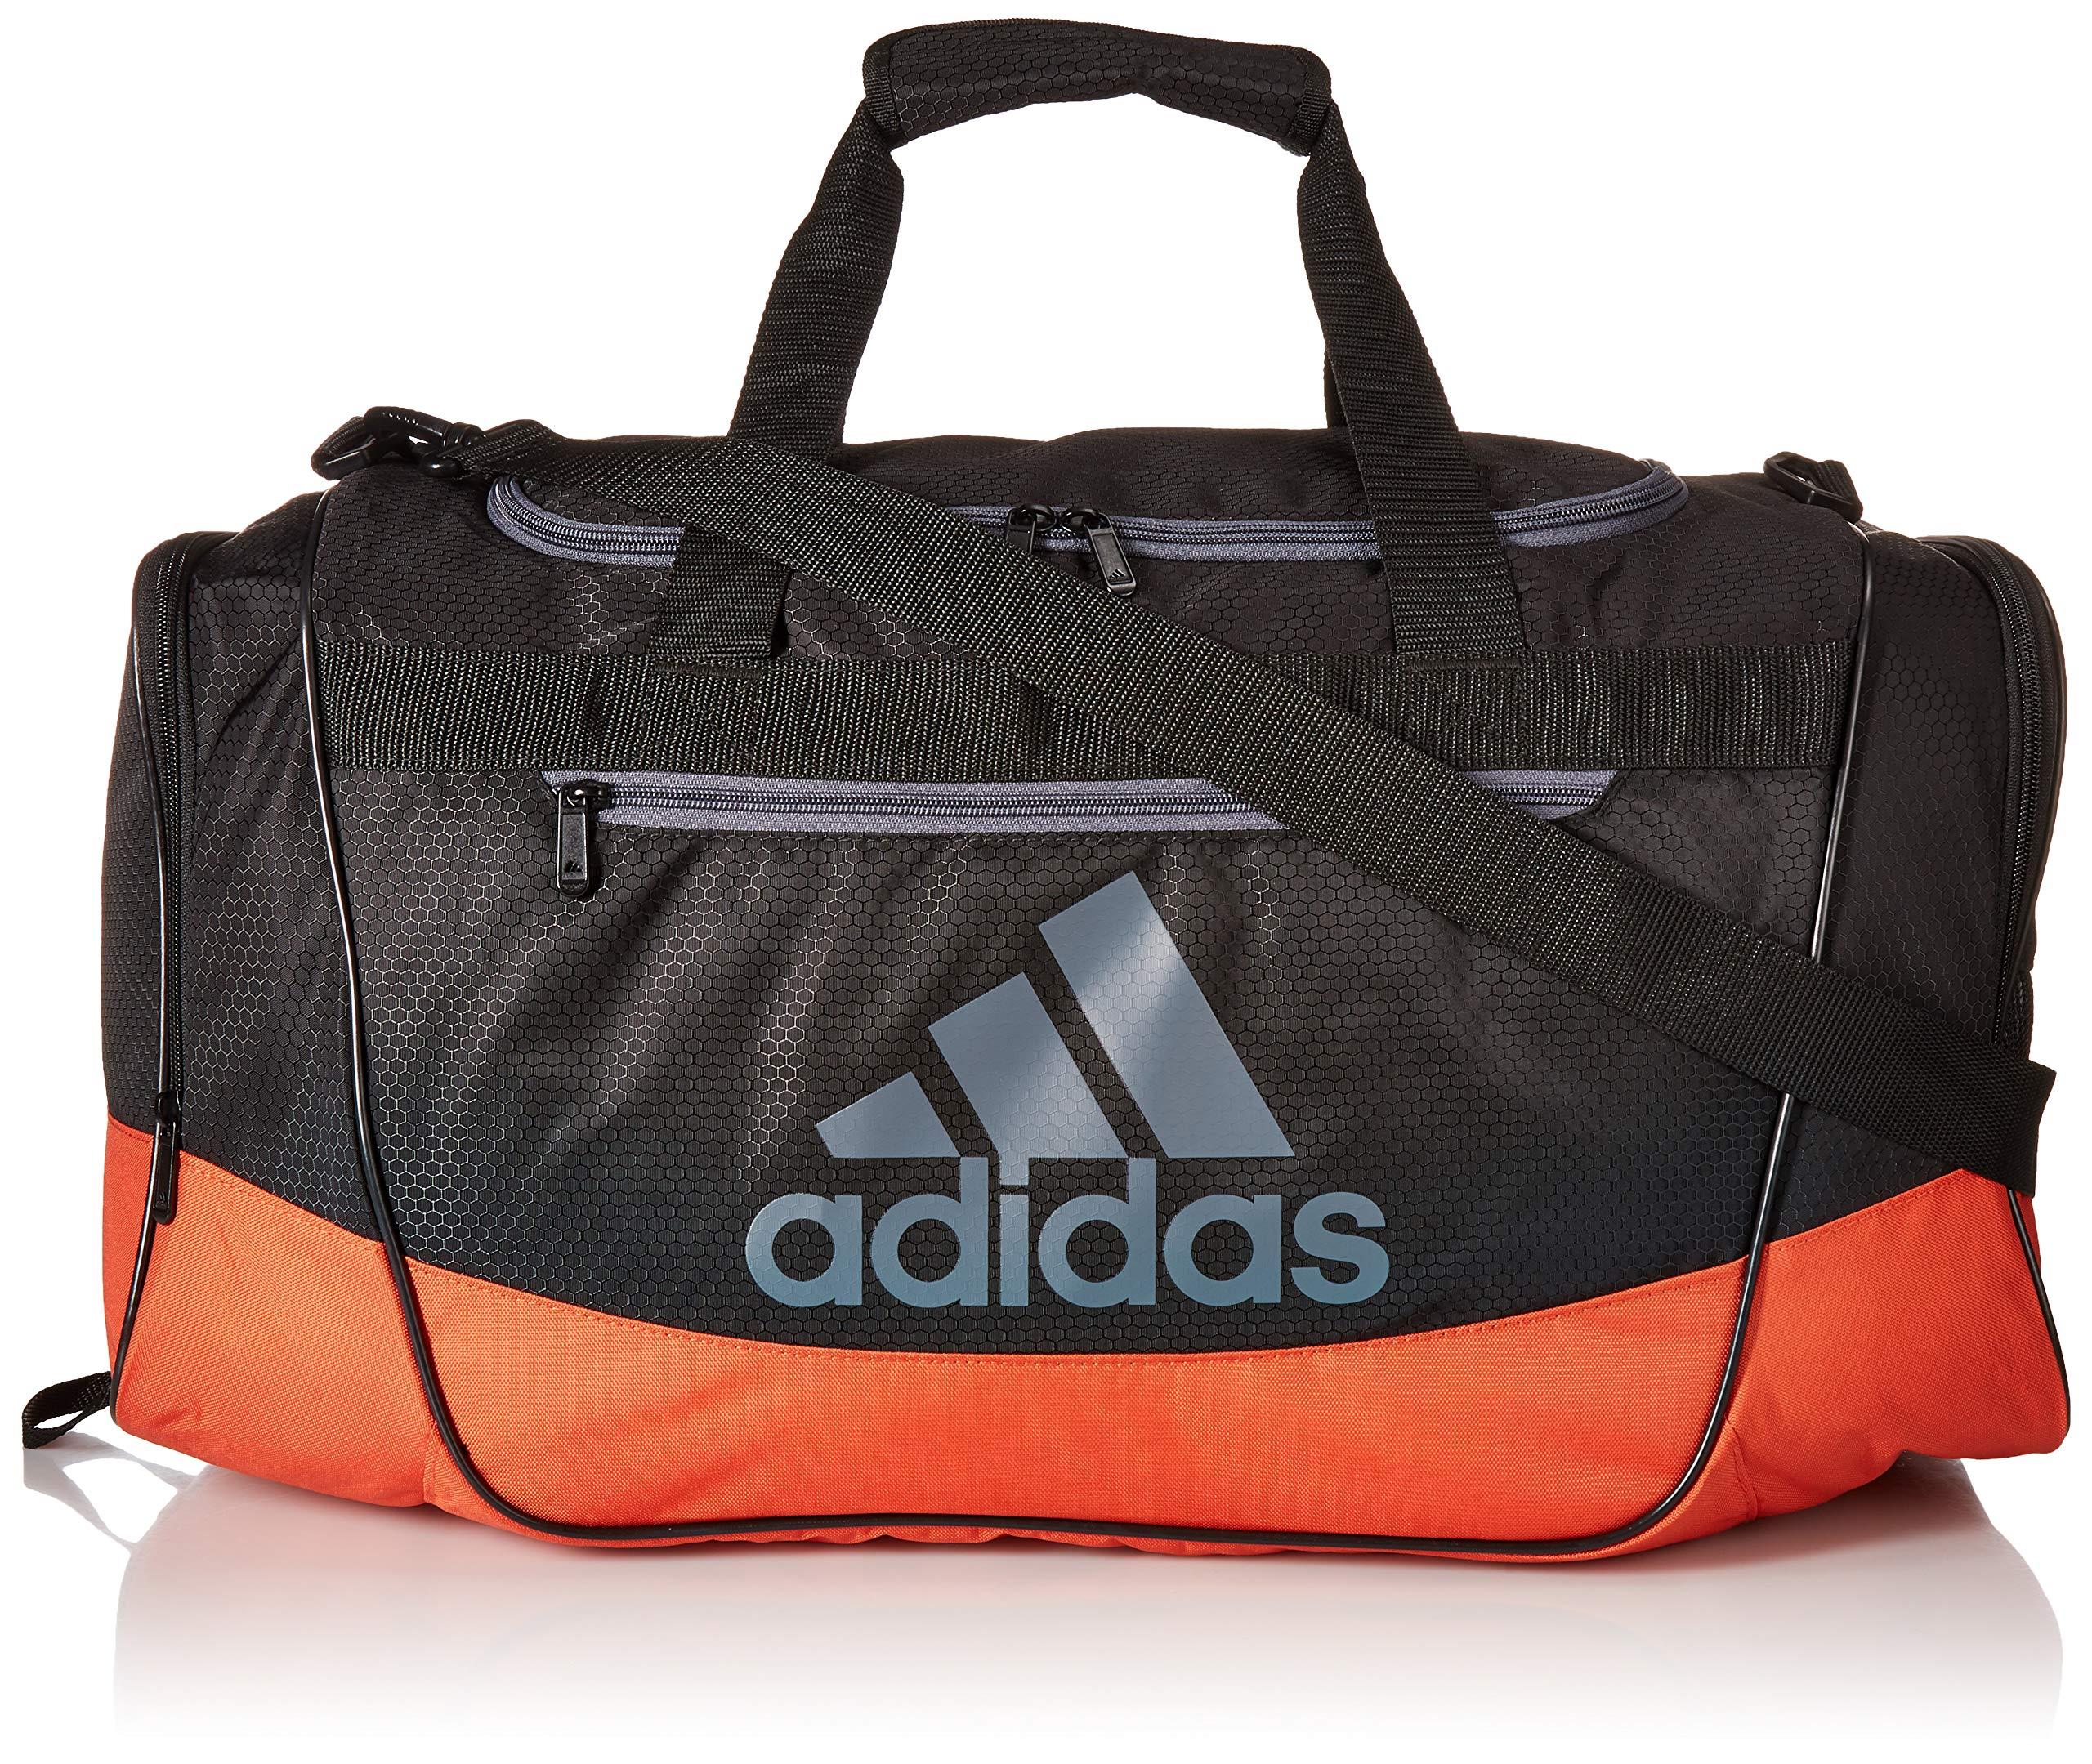 adidas Defender III Medium Duffel, Black/Raw Amber Orange/Onix, One Size